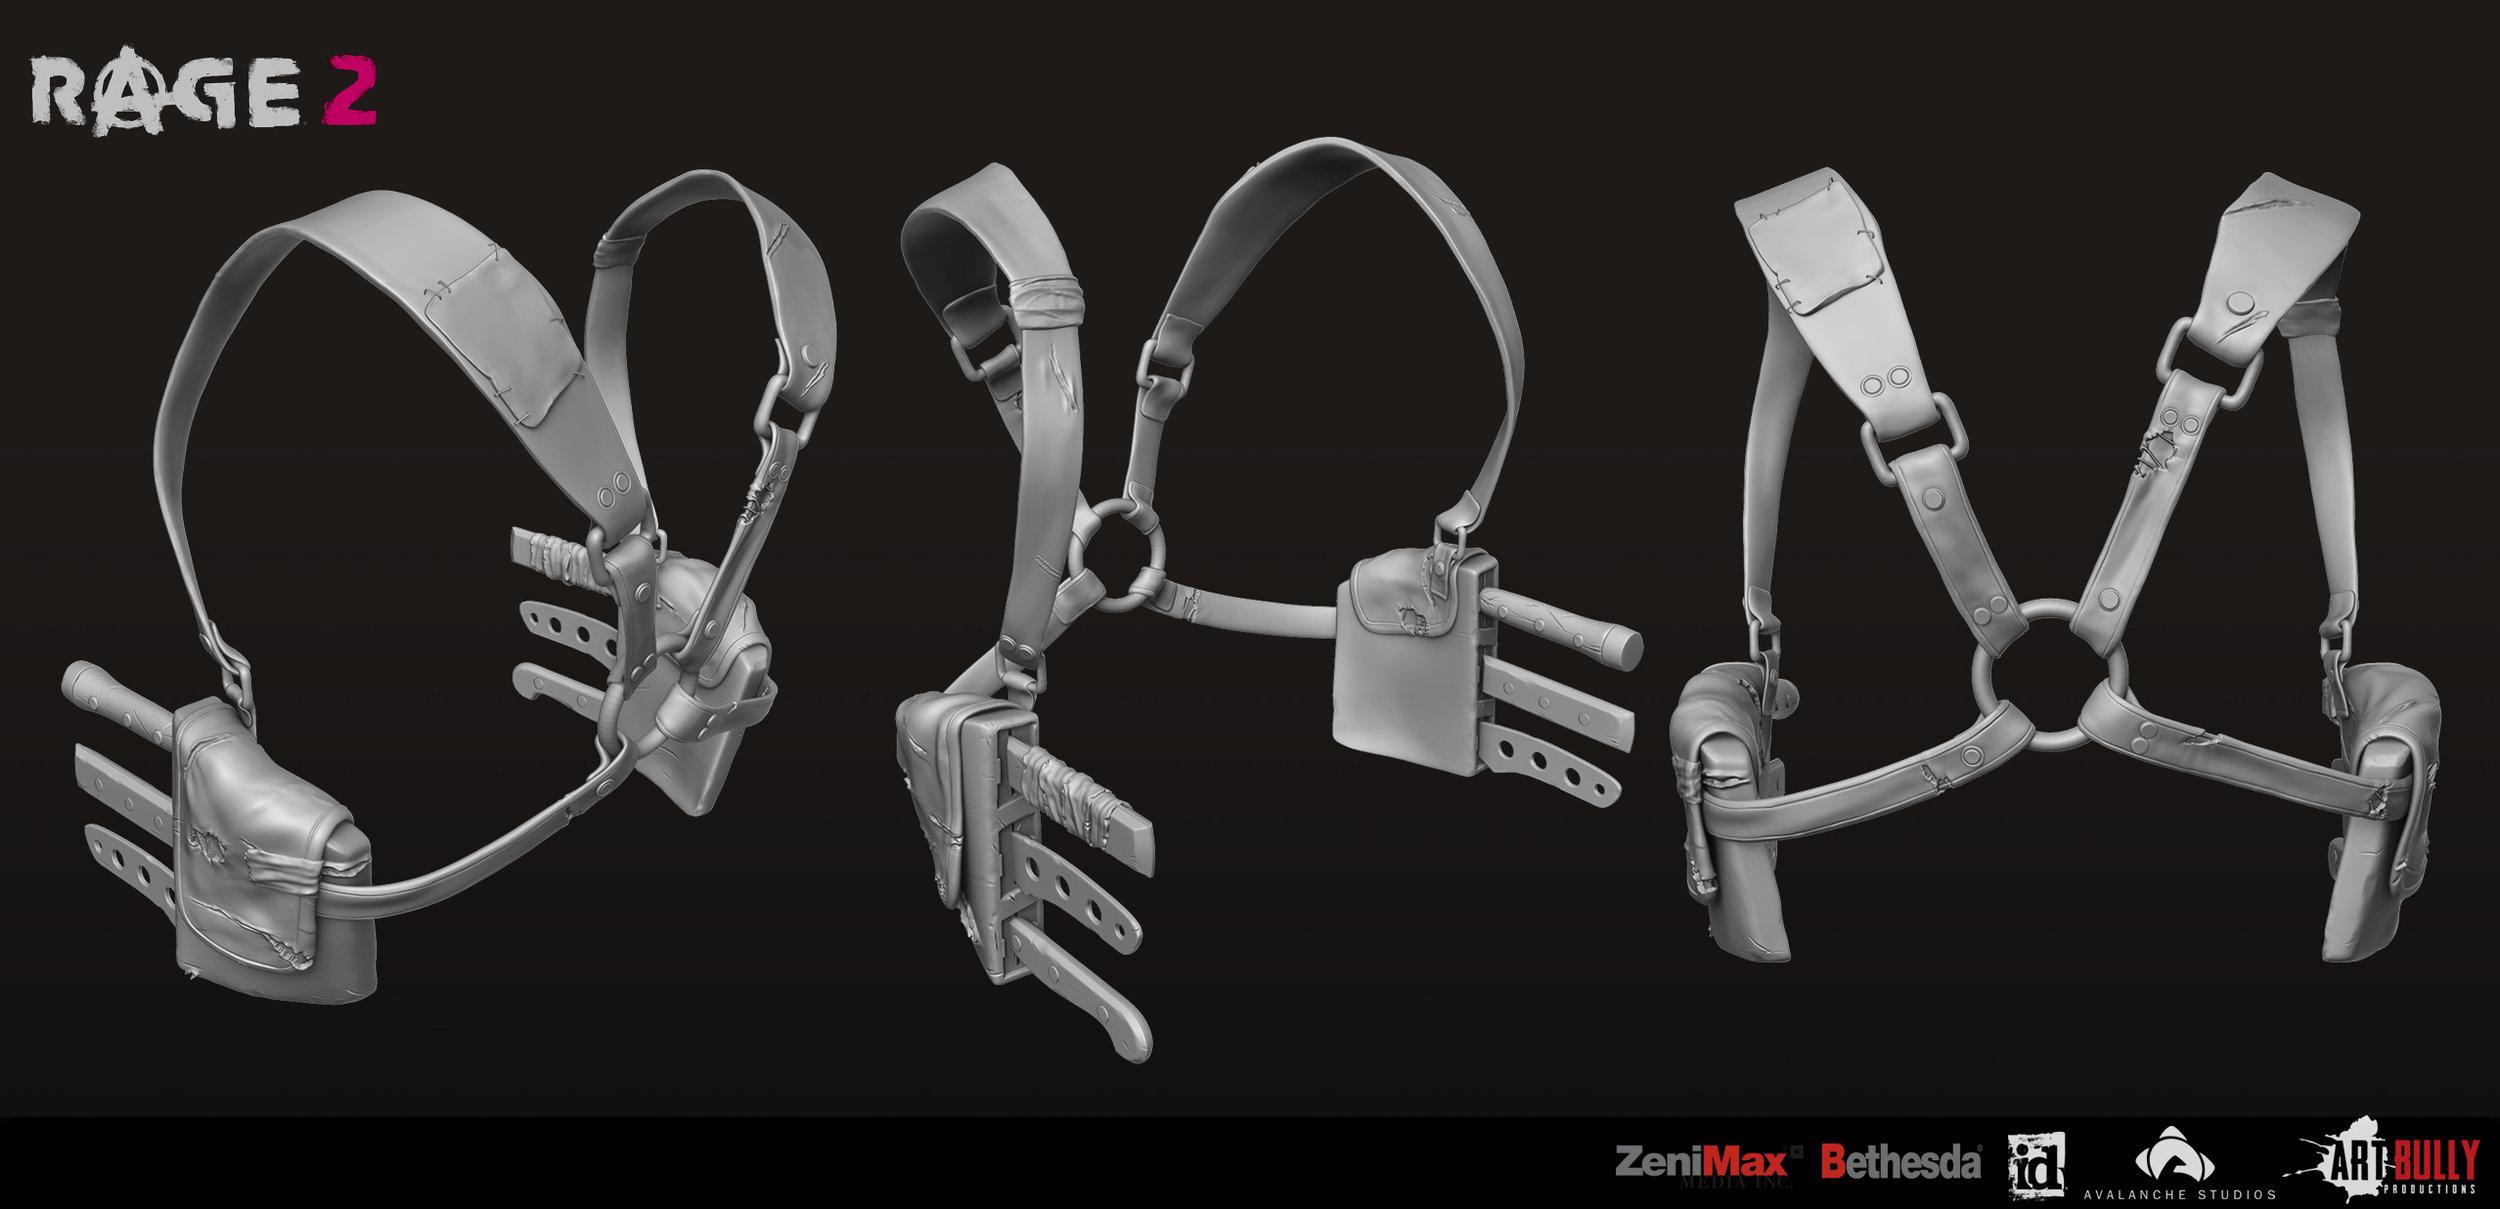 Civilian_Gear_Set_03_Weapon_Holsters_01_Knife_Holster_render.jpg